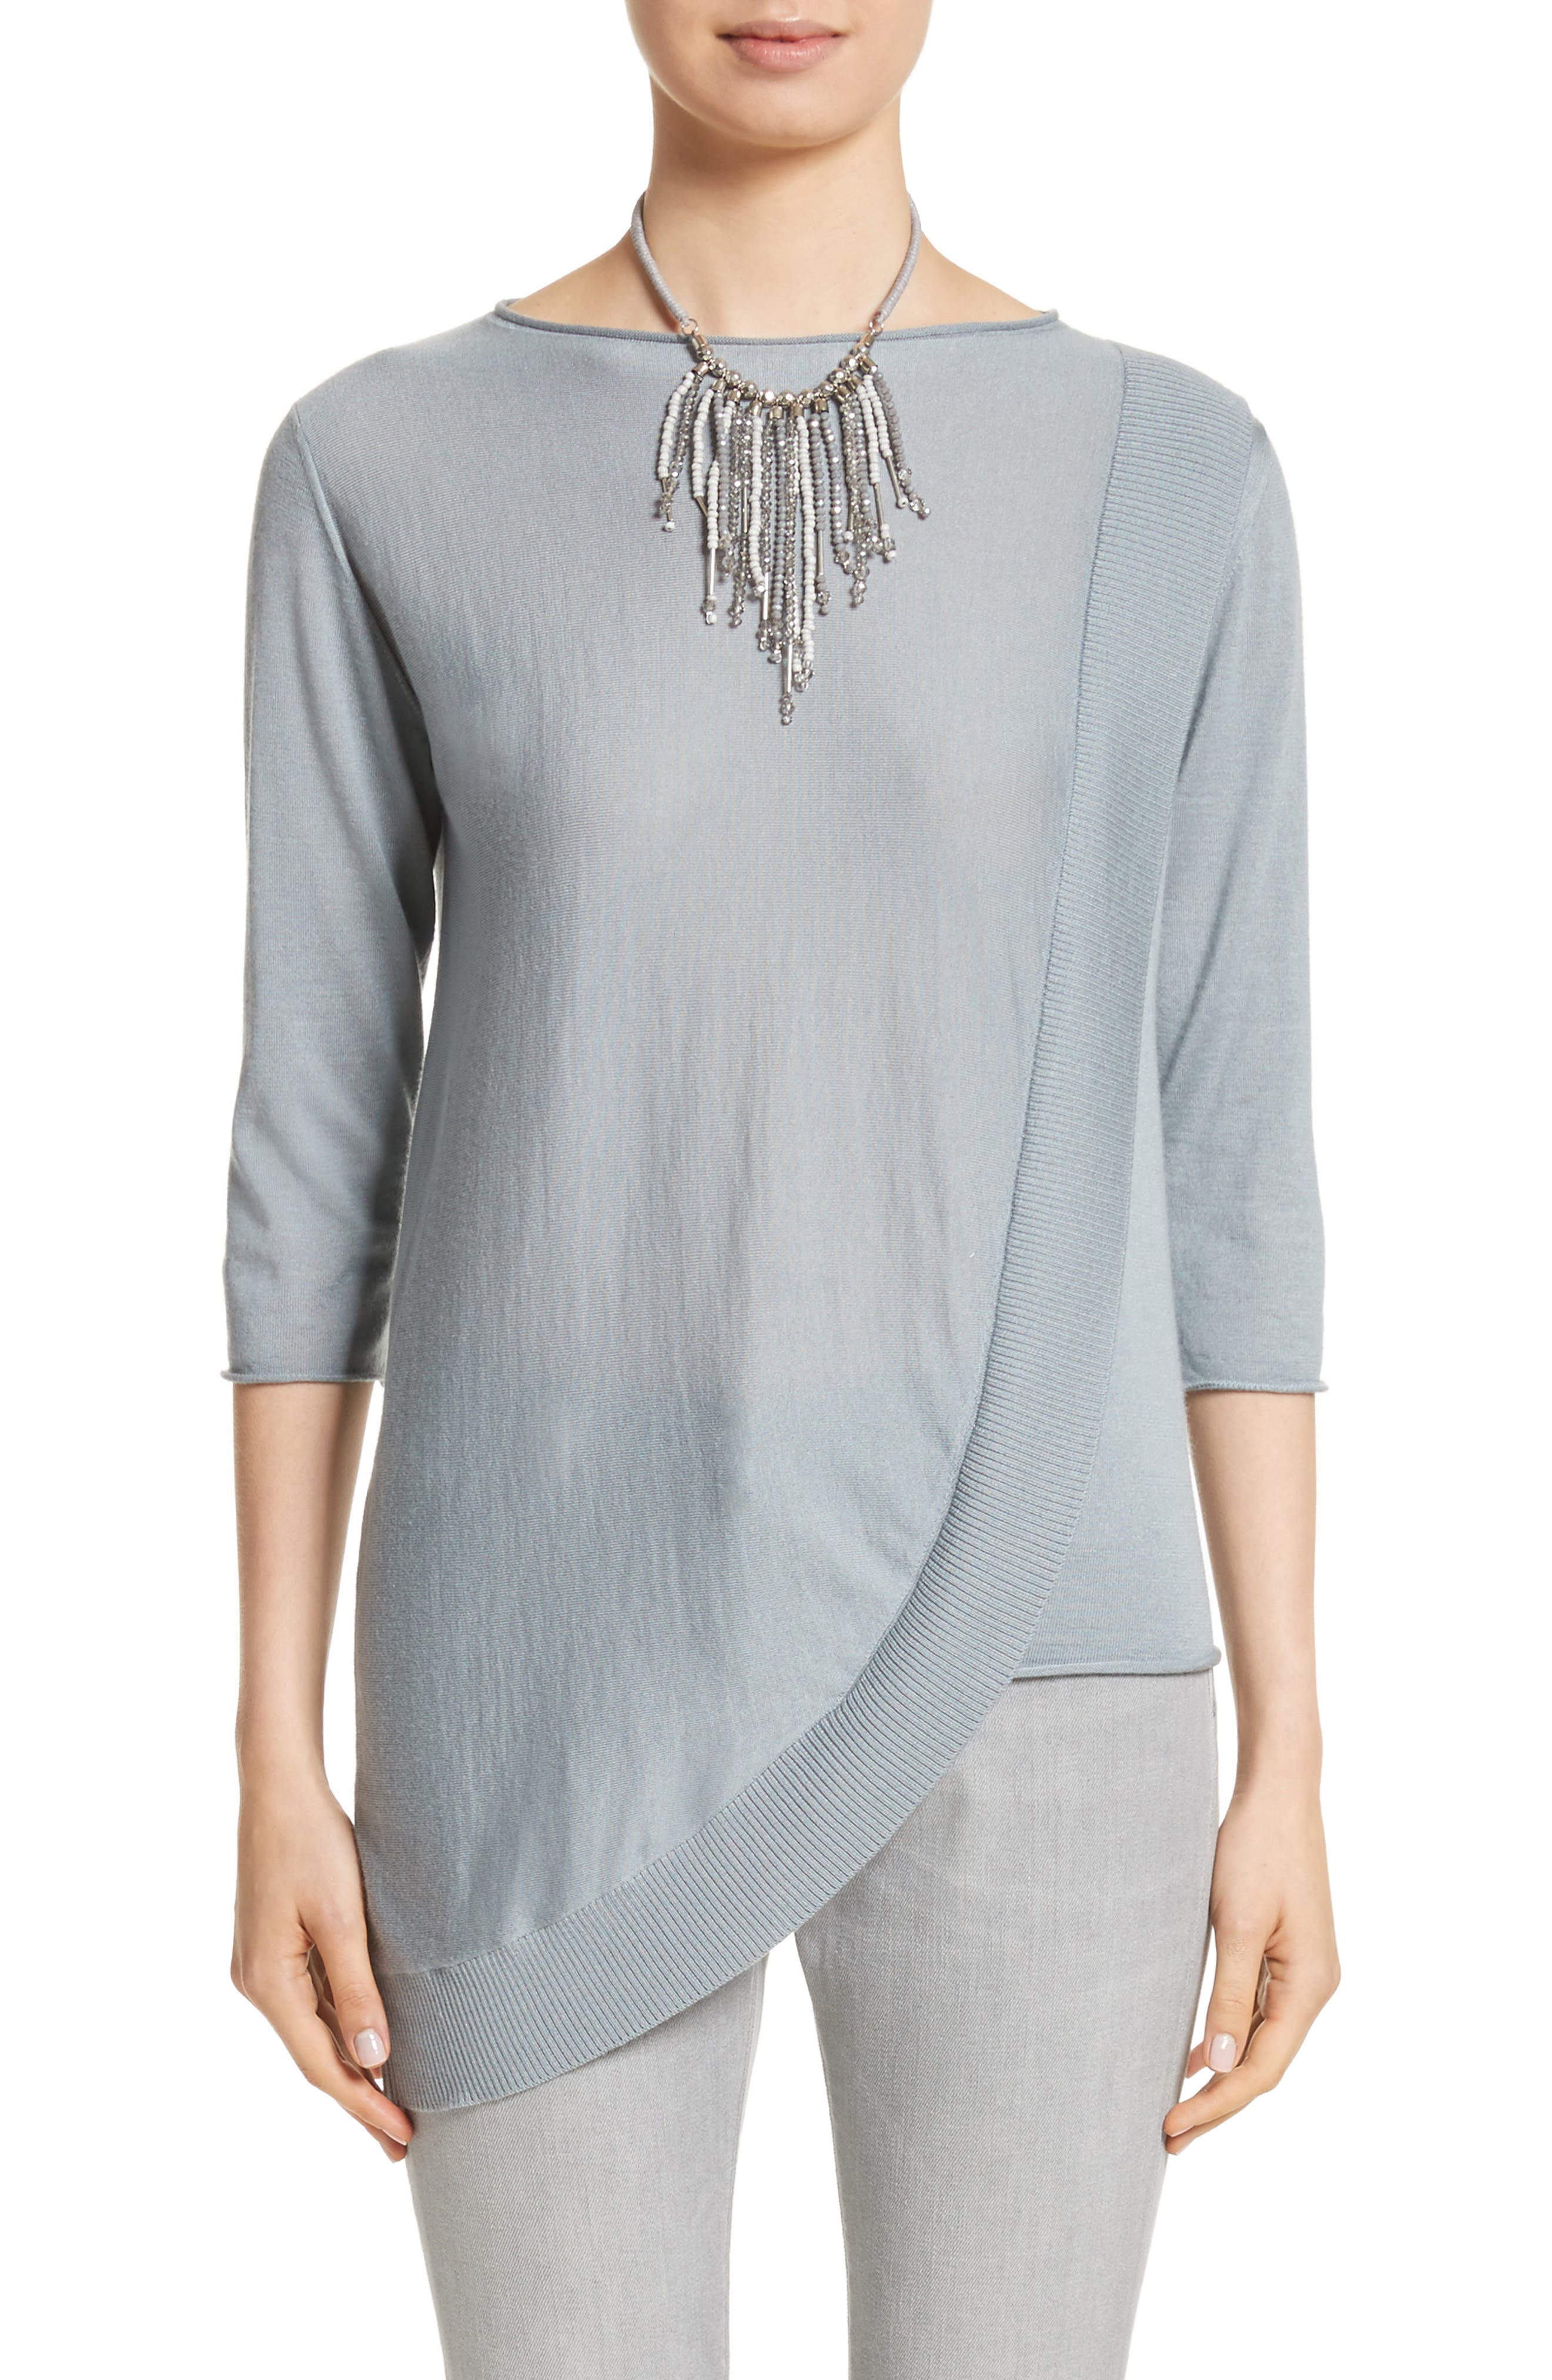 Alternate Image 1 Selected - Fabiana Filippi Cashmere & Silk Drape Sweater